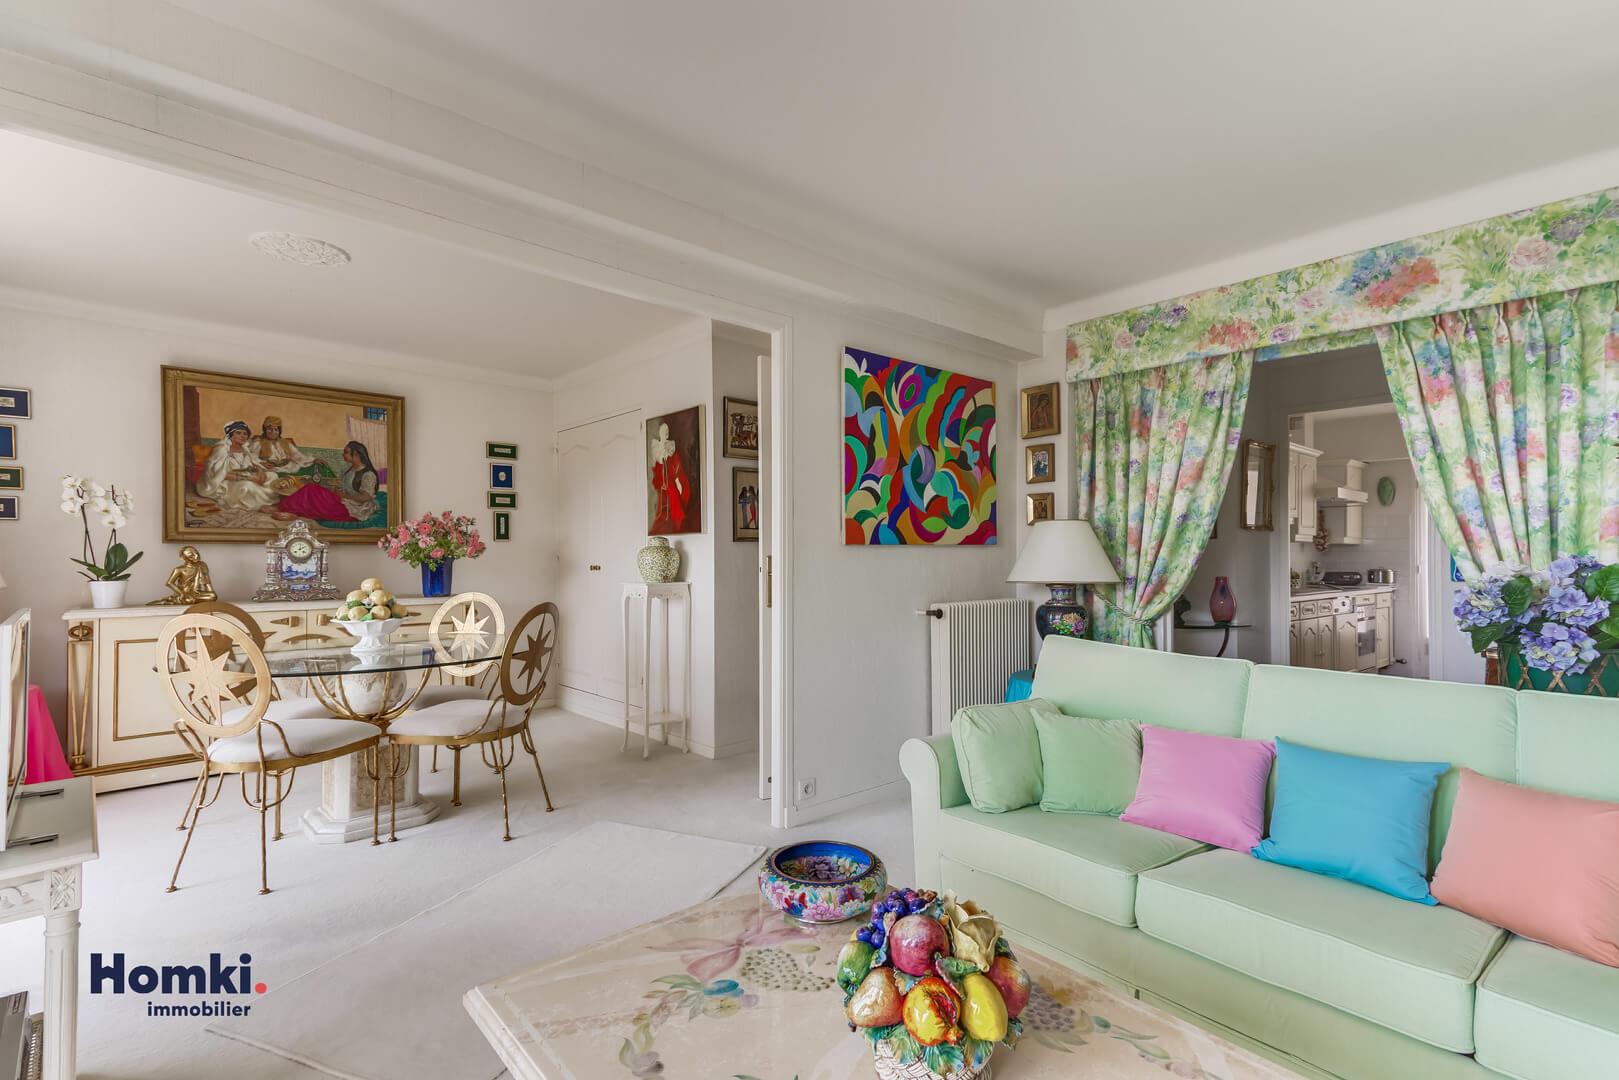 Vente appartement Grasse T3 06520 French Riviera_5